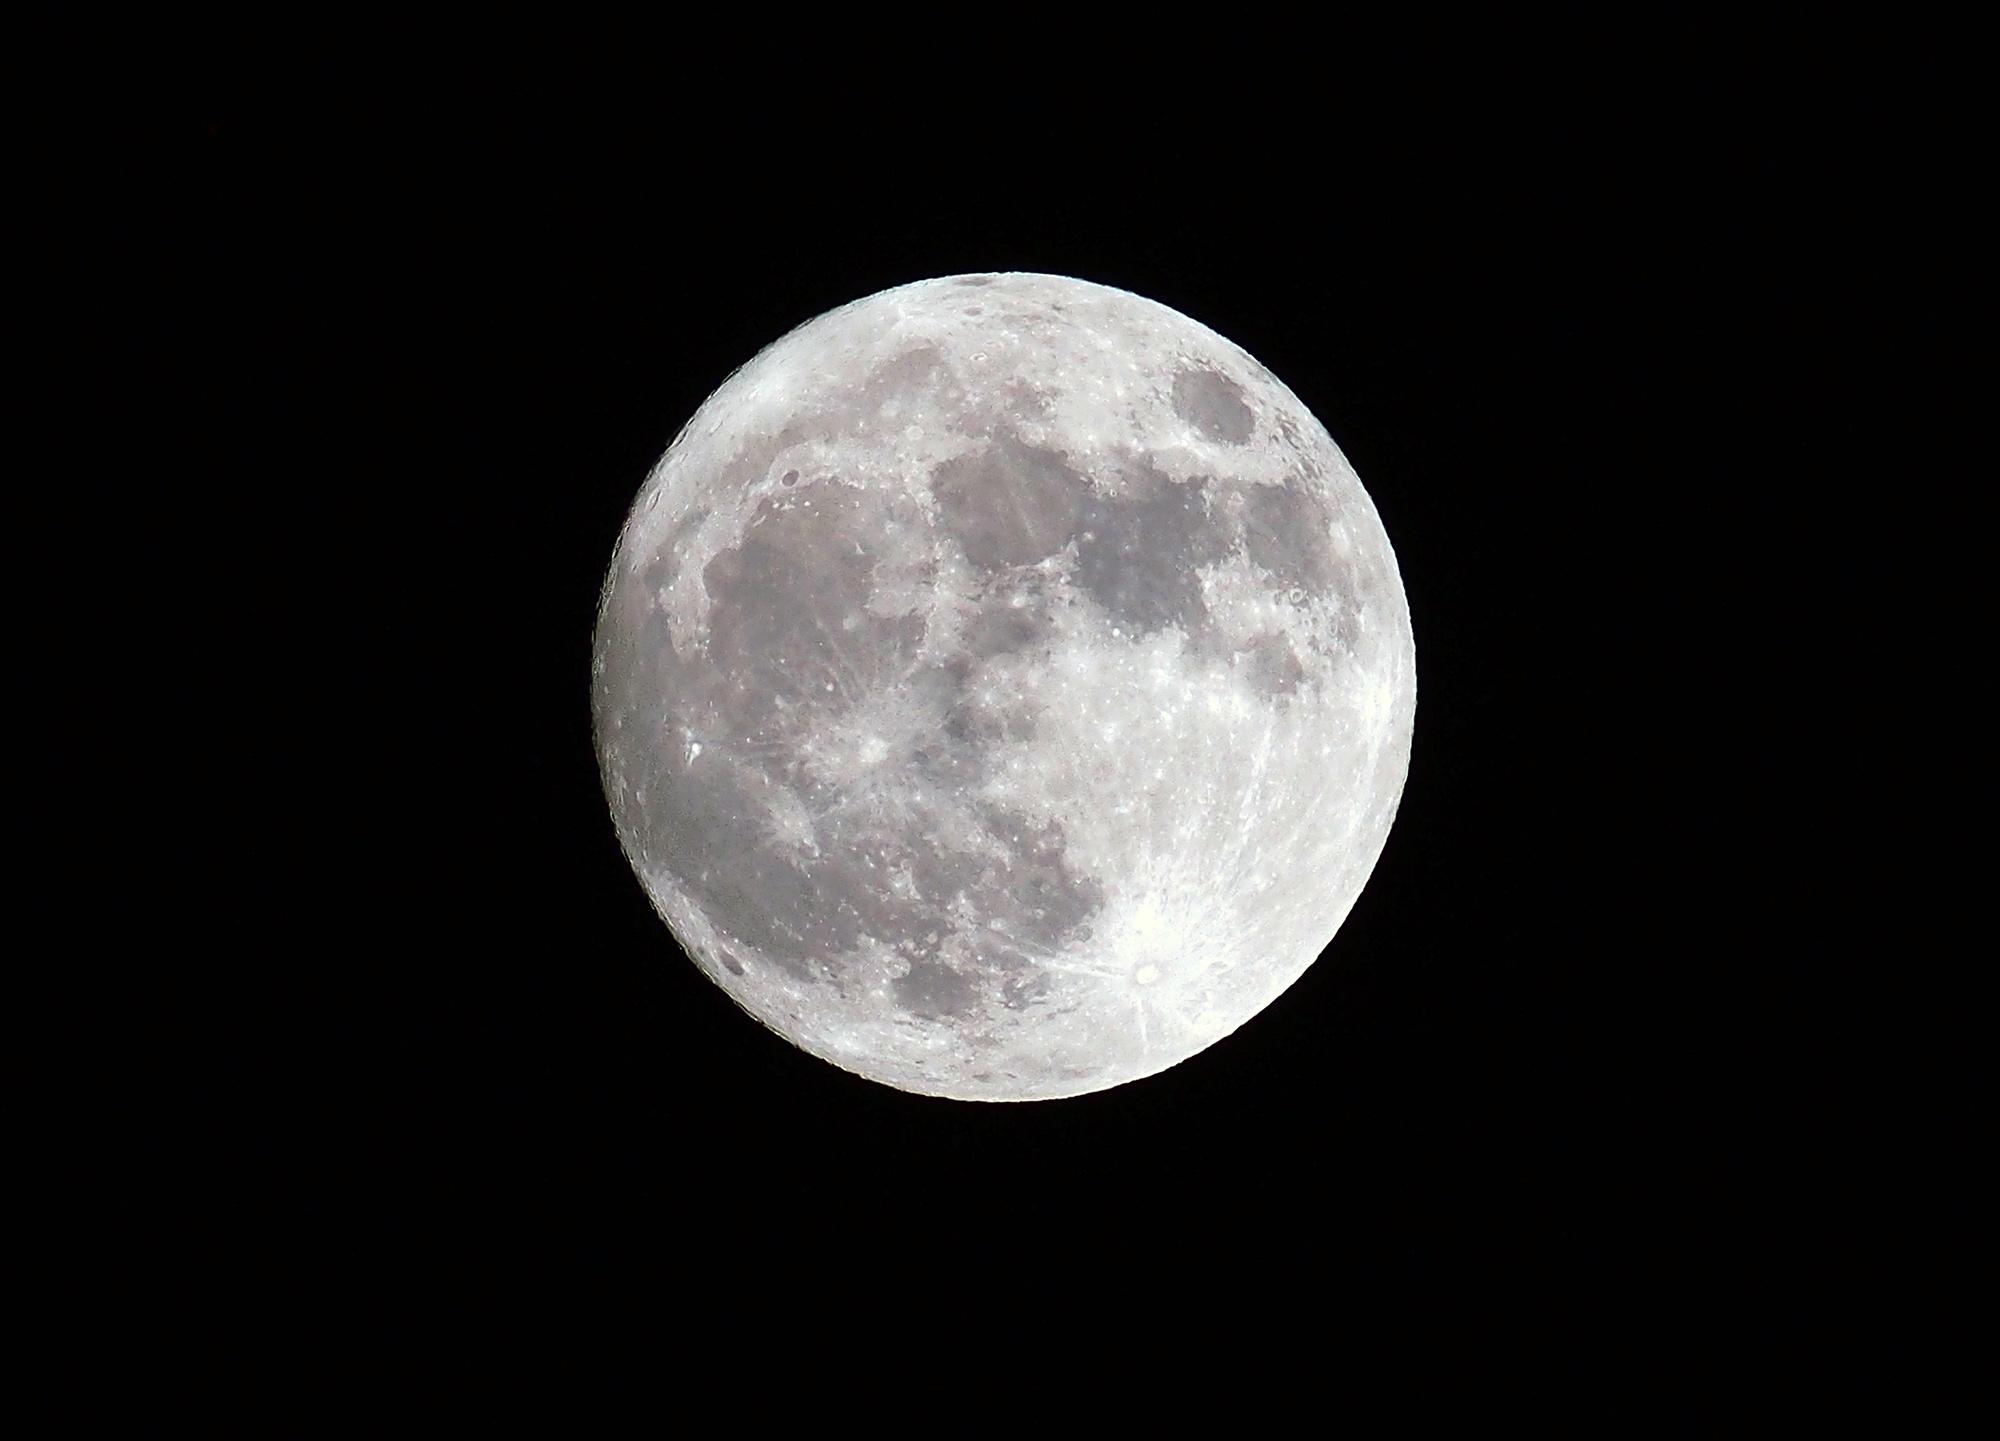 Tiny 'MoonWatcher' Satellite Will Beam Home Live Lunar Views